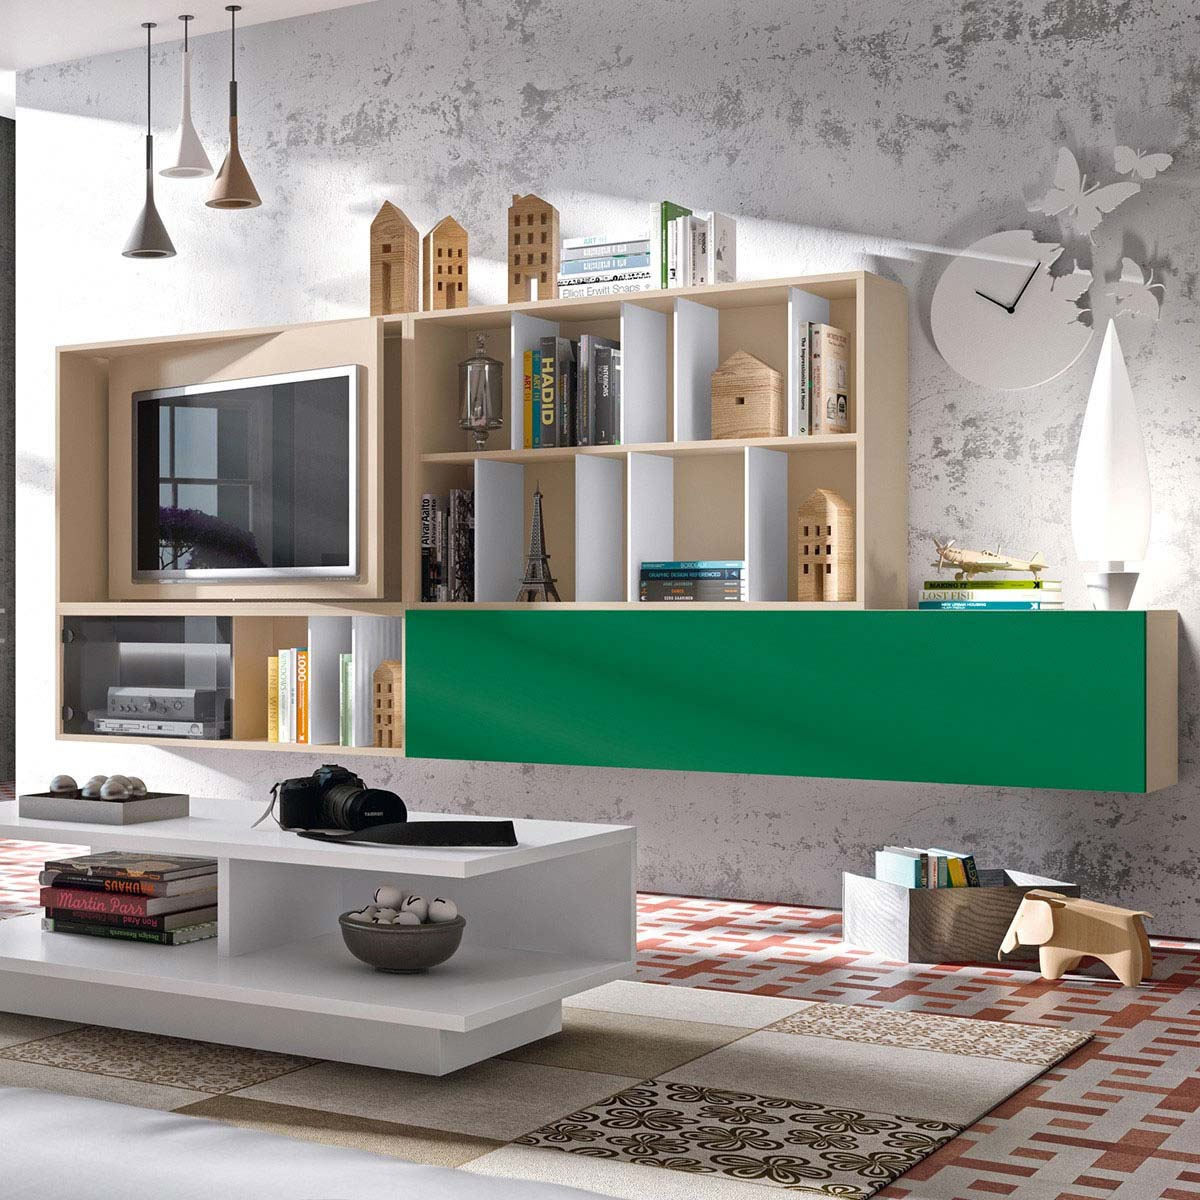 Meuble tv mural avec panneau pivotant for Designer meuble bois